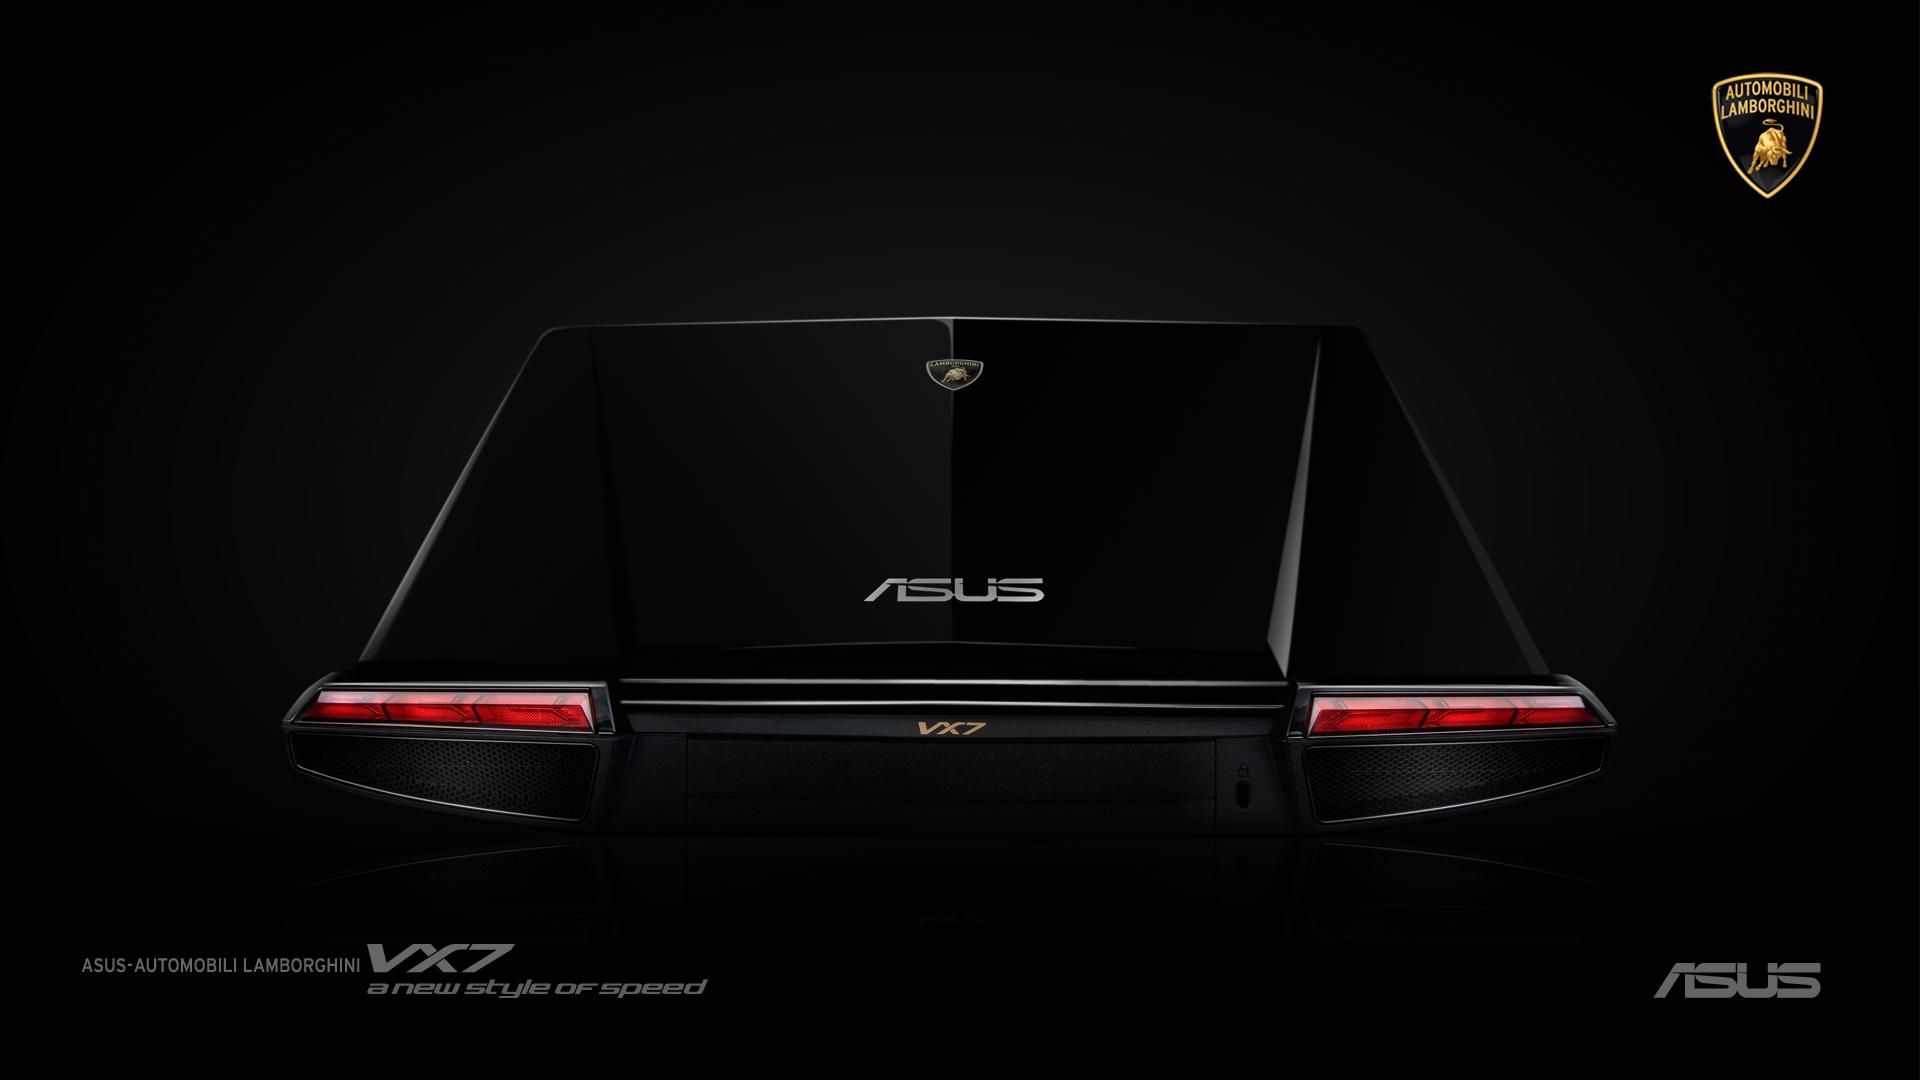 Asus Mobile Wallpaper: VX7